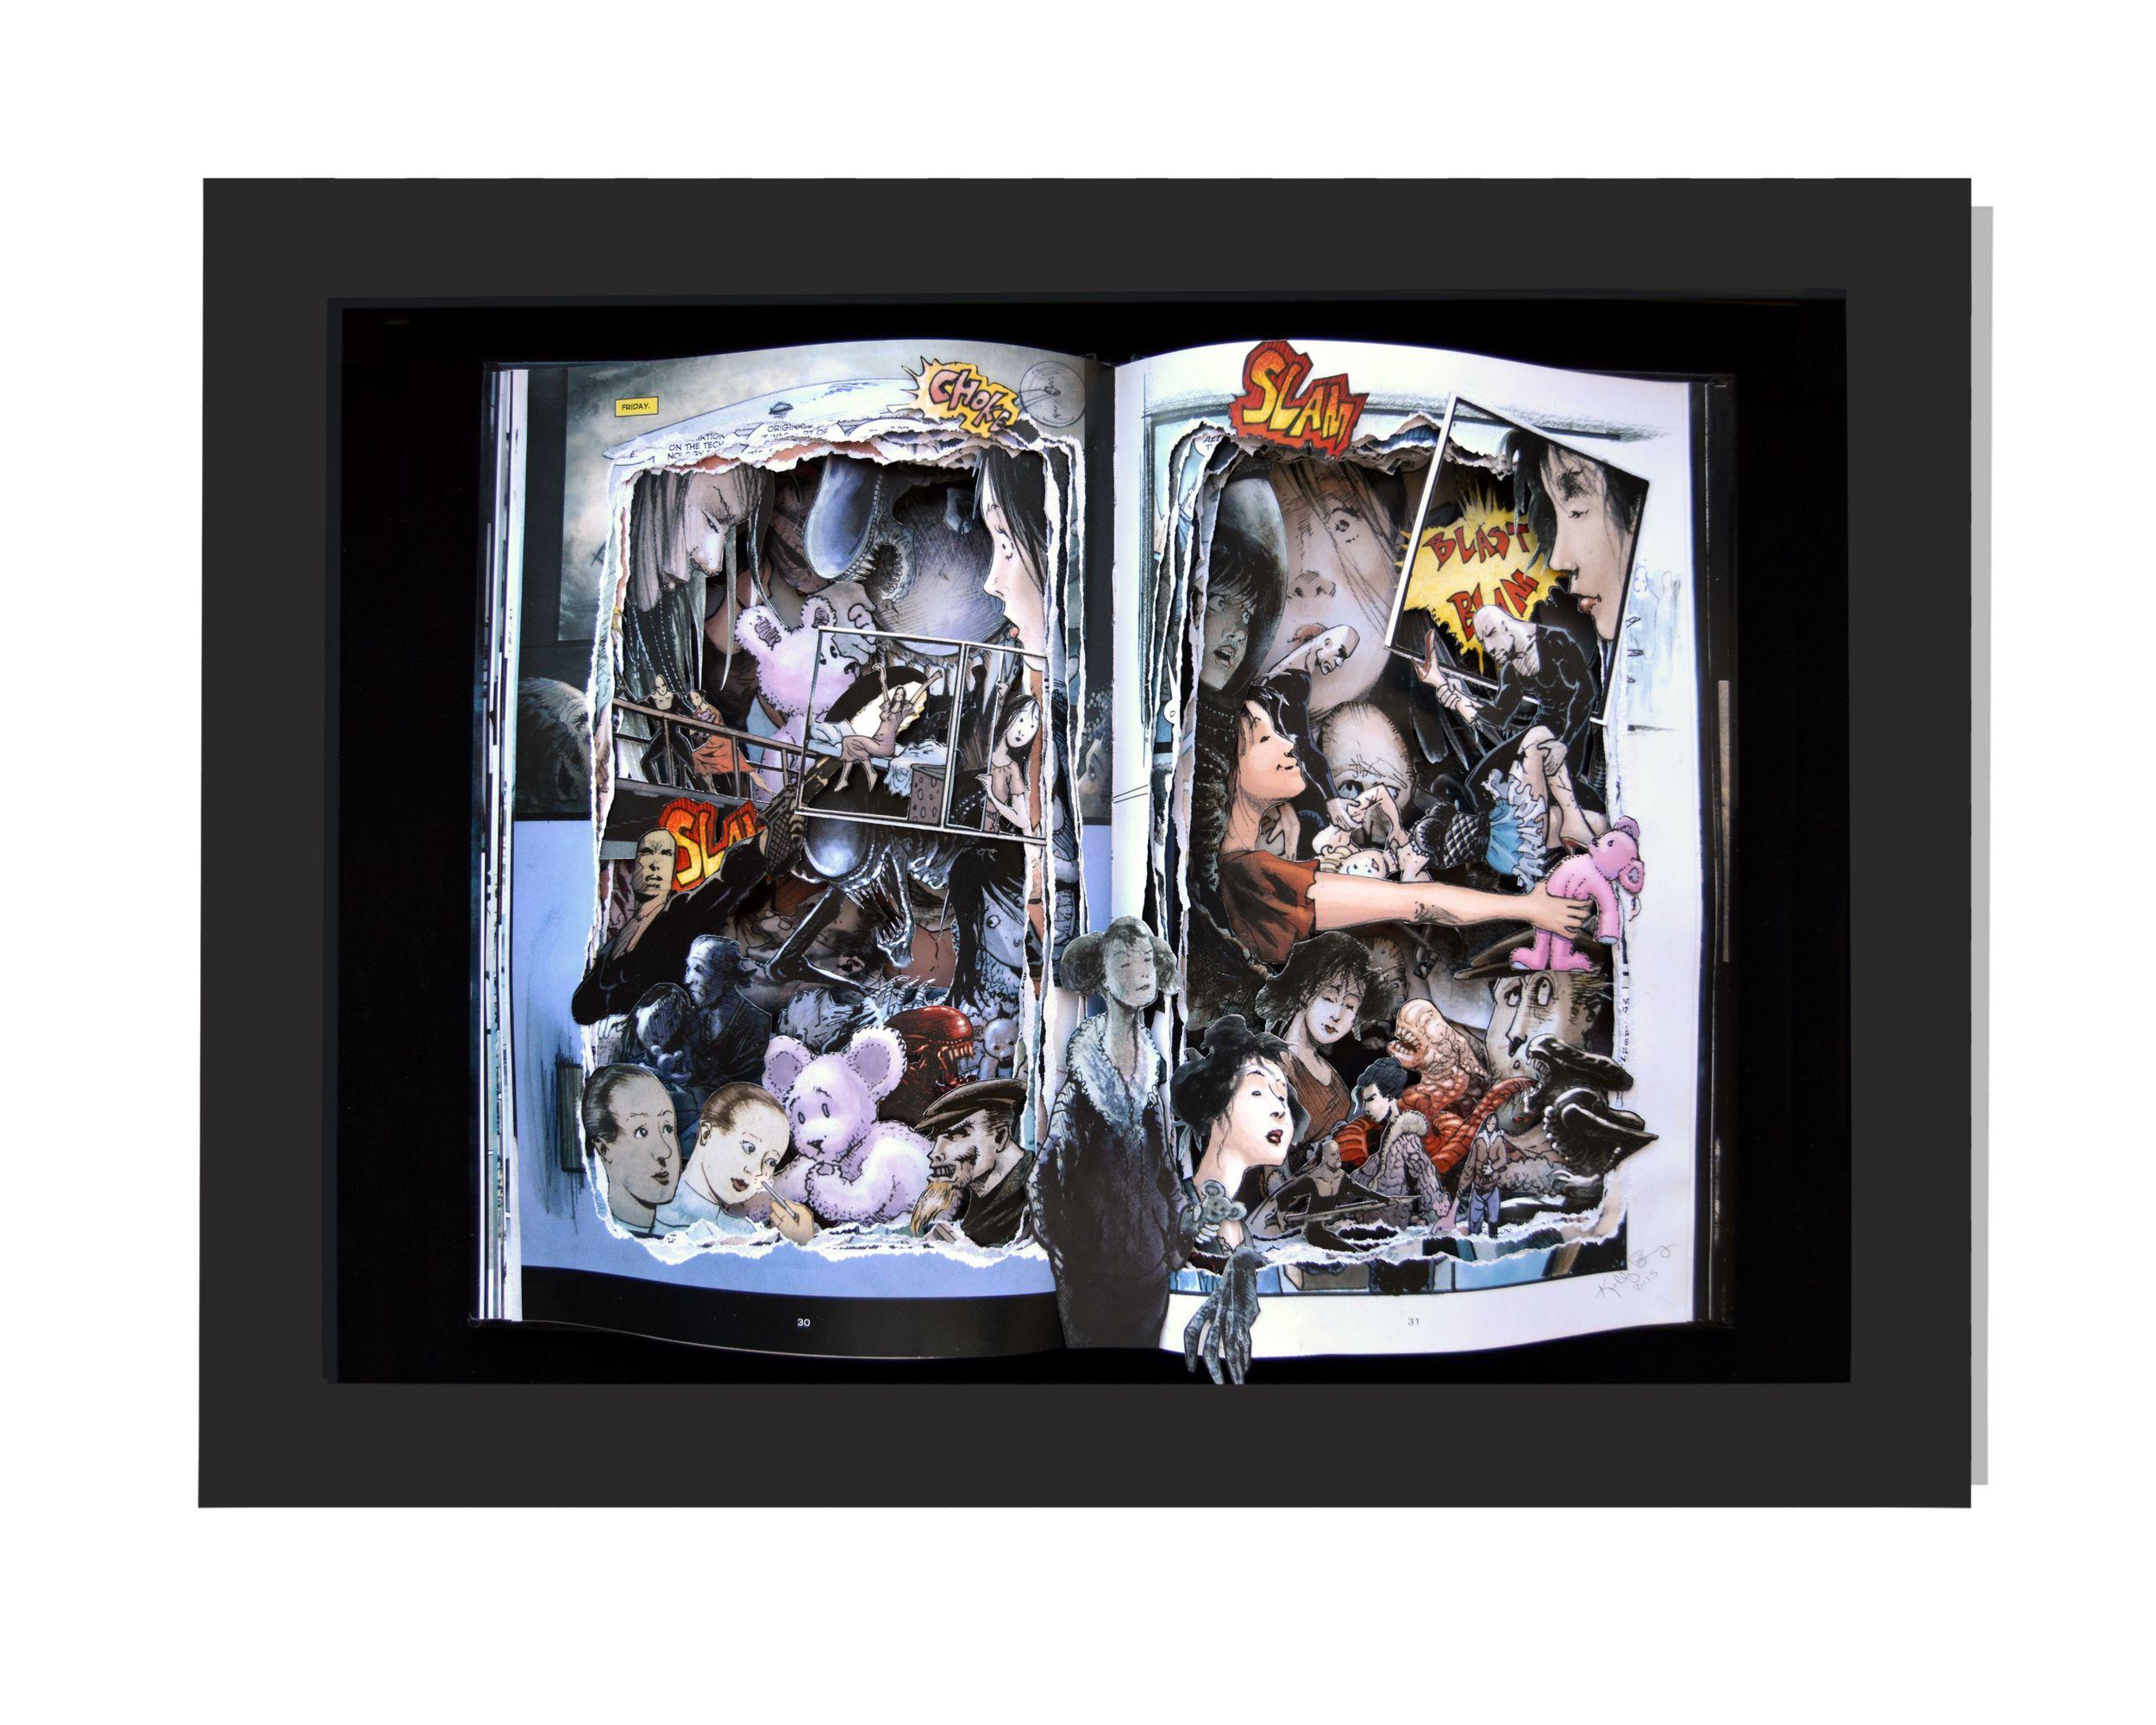 ALIENS 12x16x3 Custom Order Book Sculpture